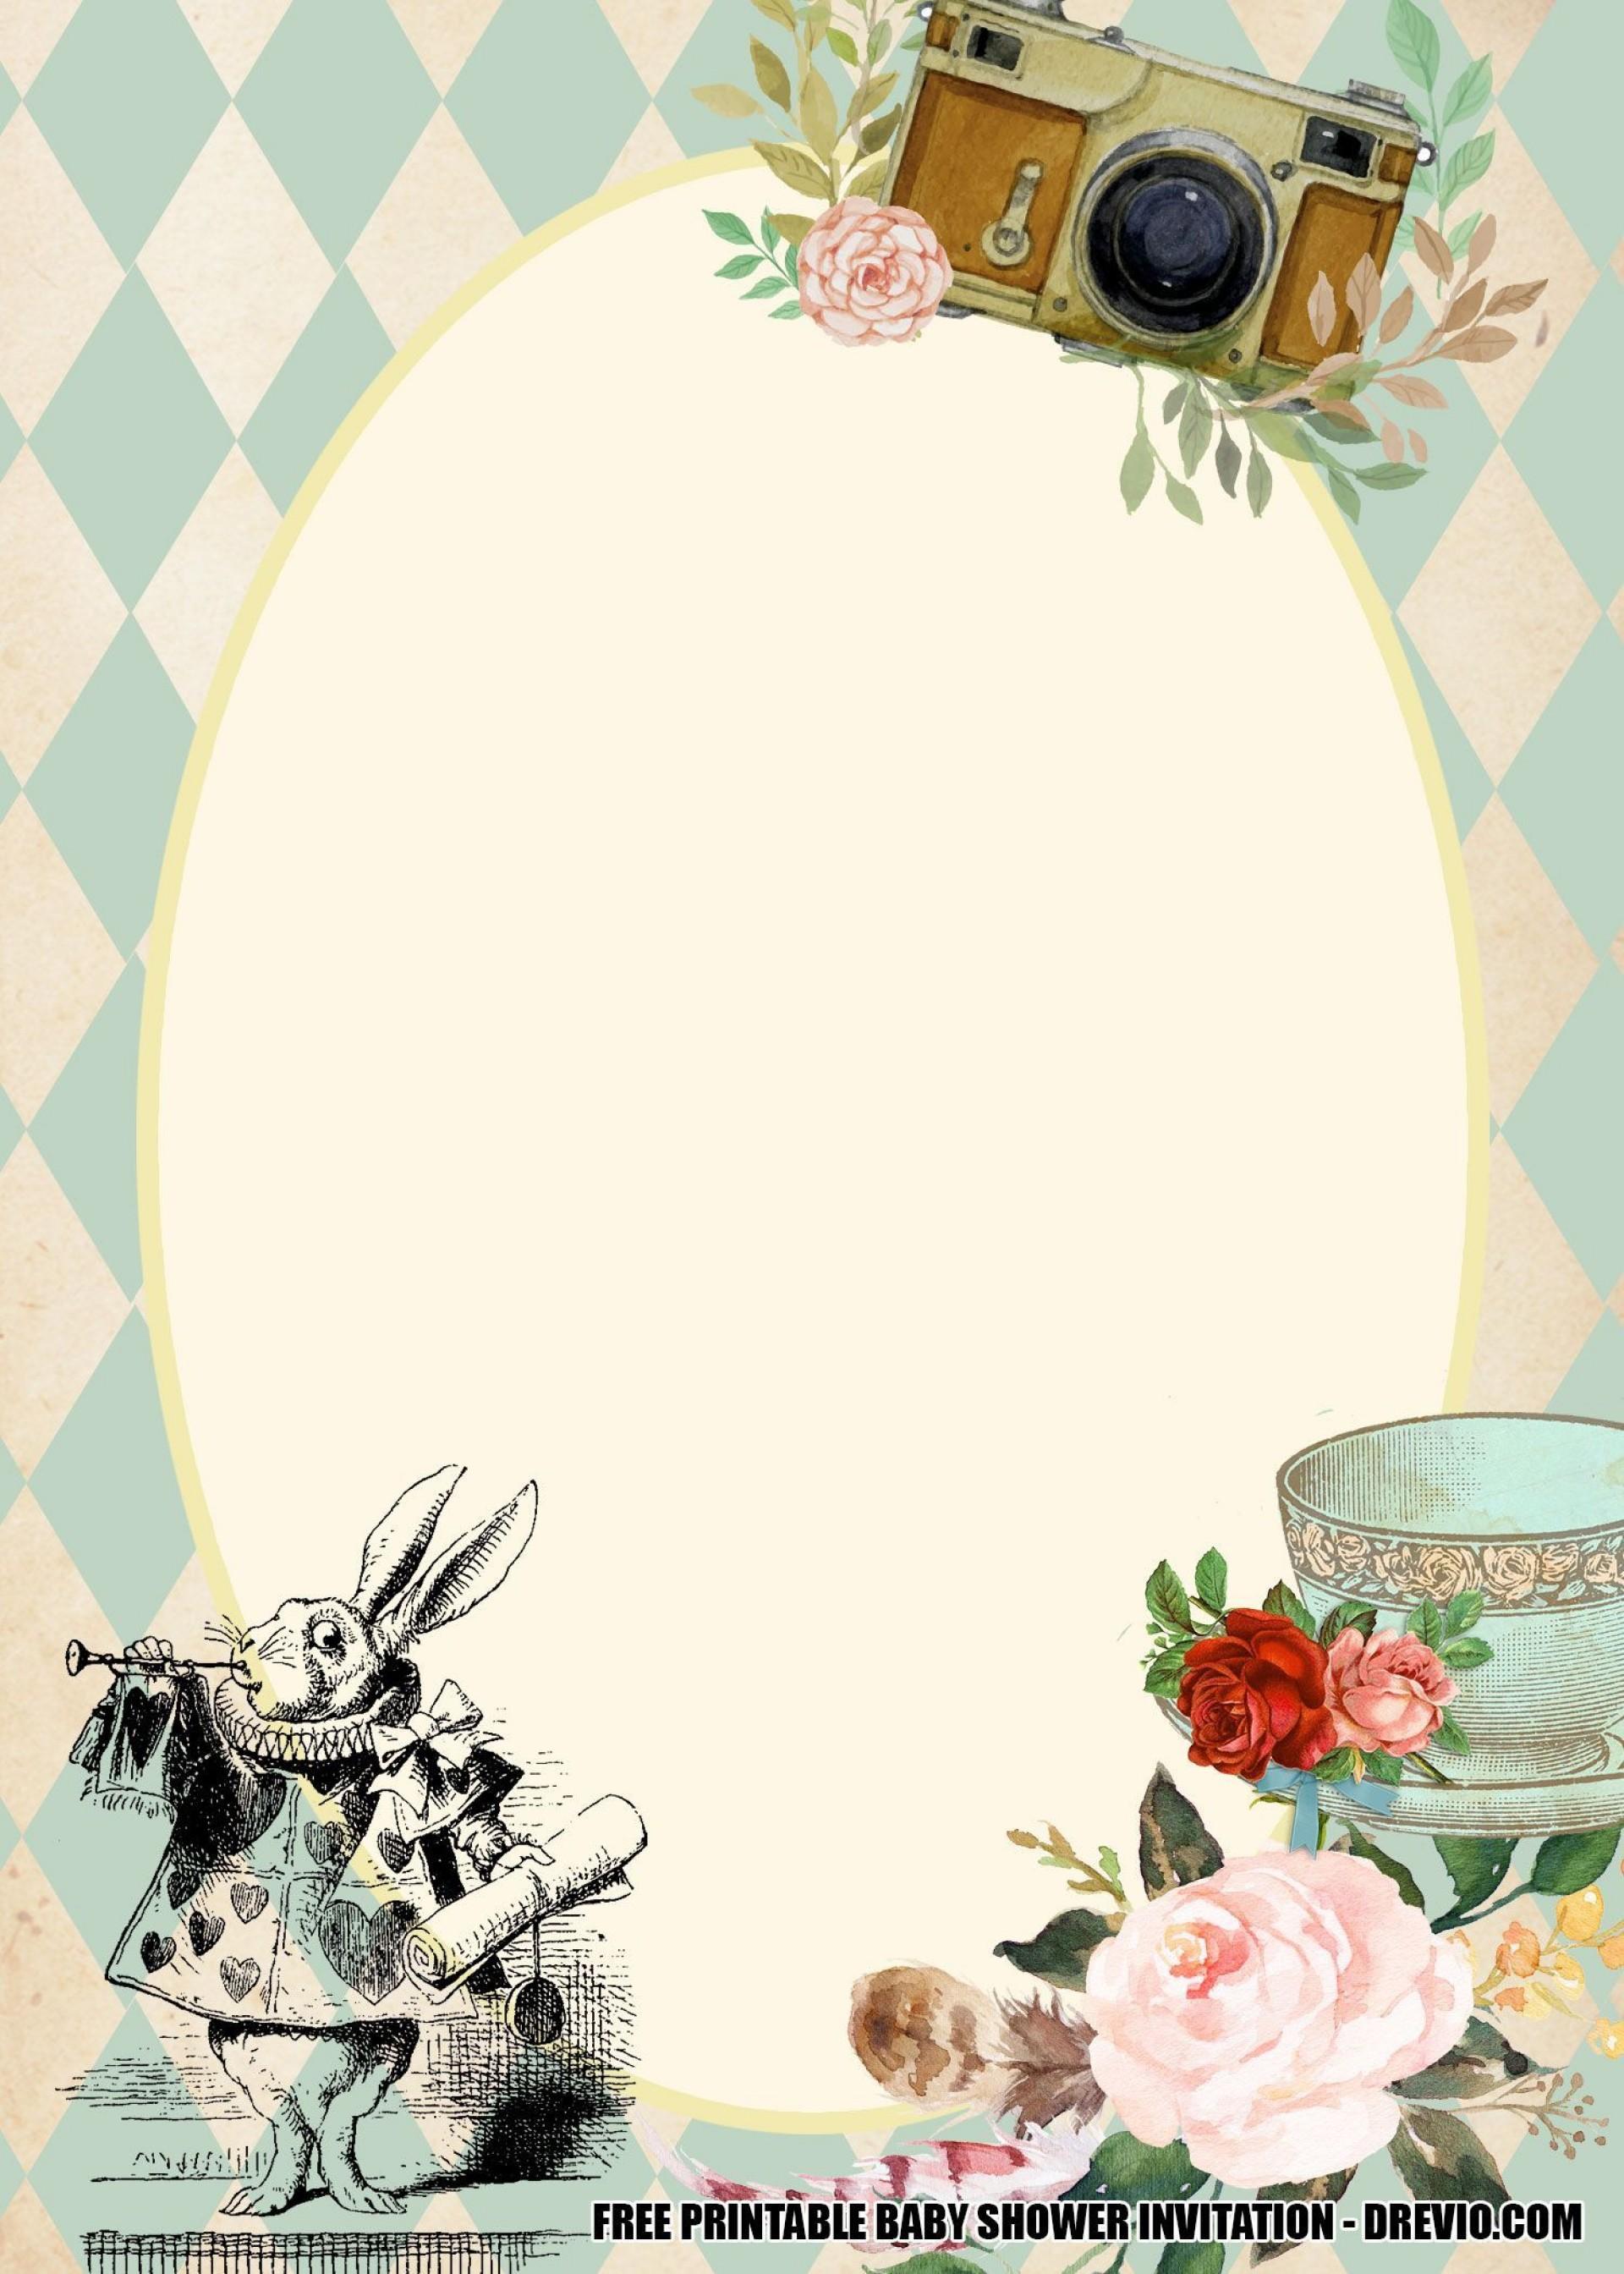 002 Awful Alice In Wonderland Invitation Template Design  Templates Wedding Birthday Free Tea Party1920